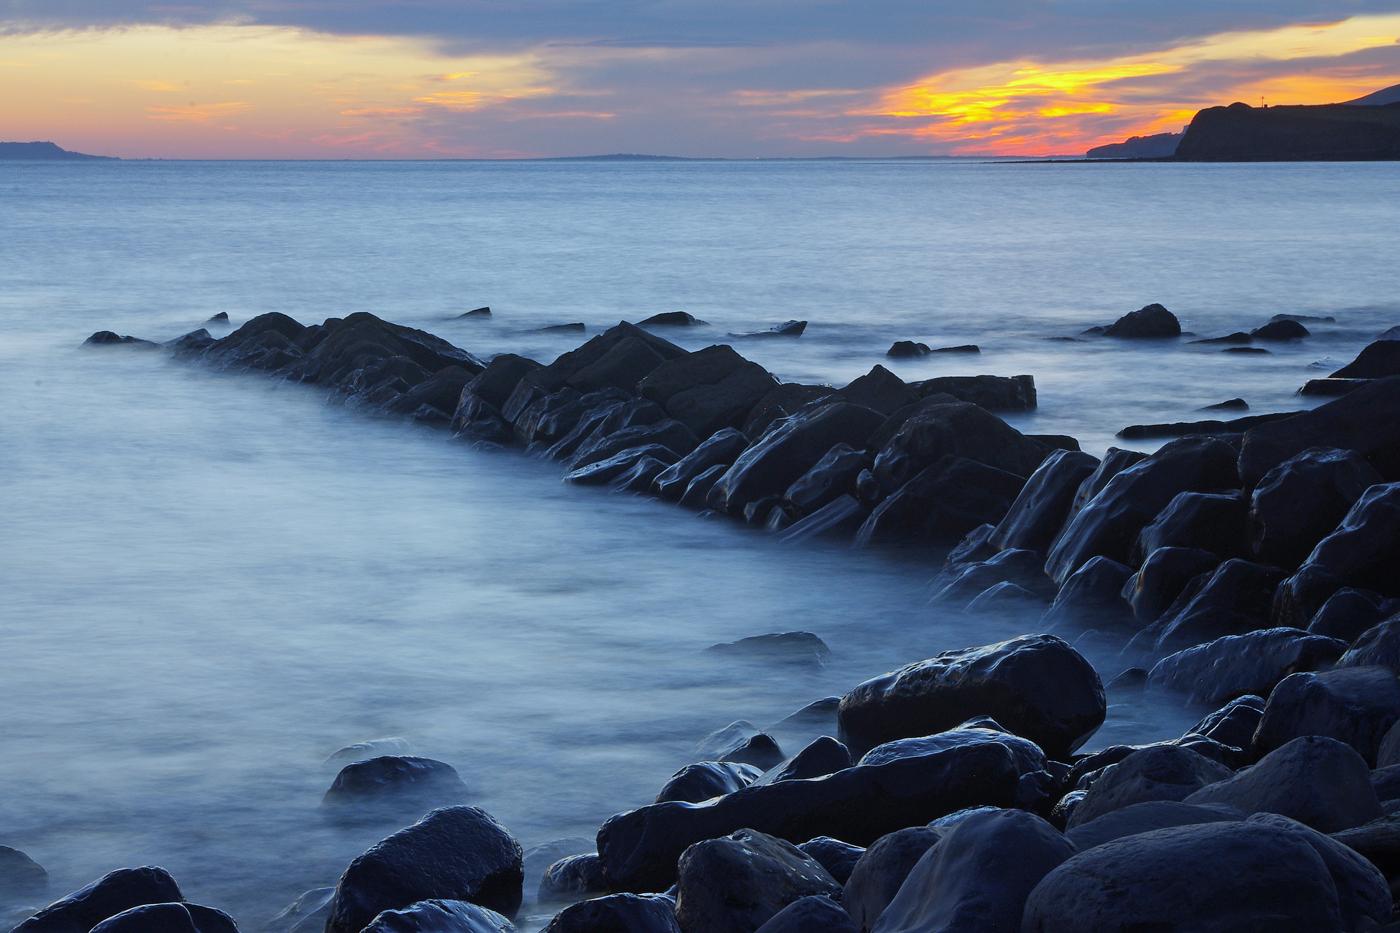 'Kimmeridge Sunset' by Richard Ramsay